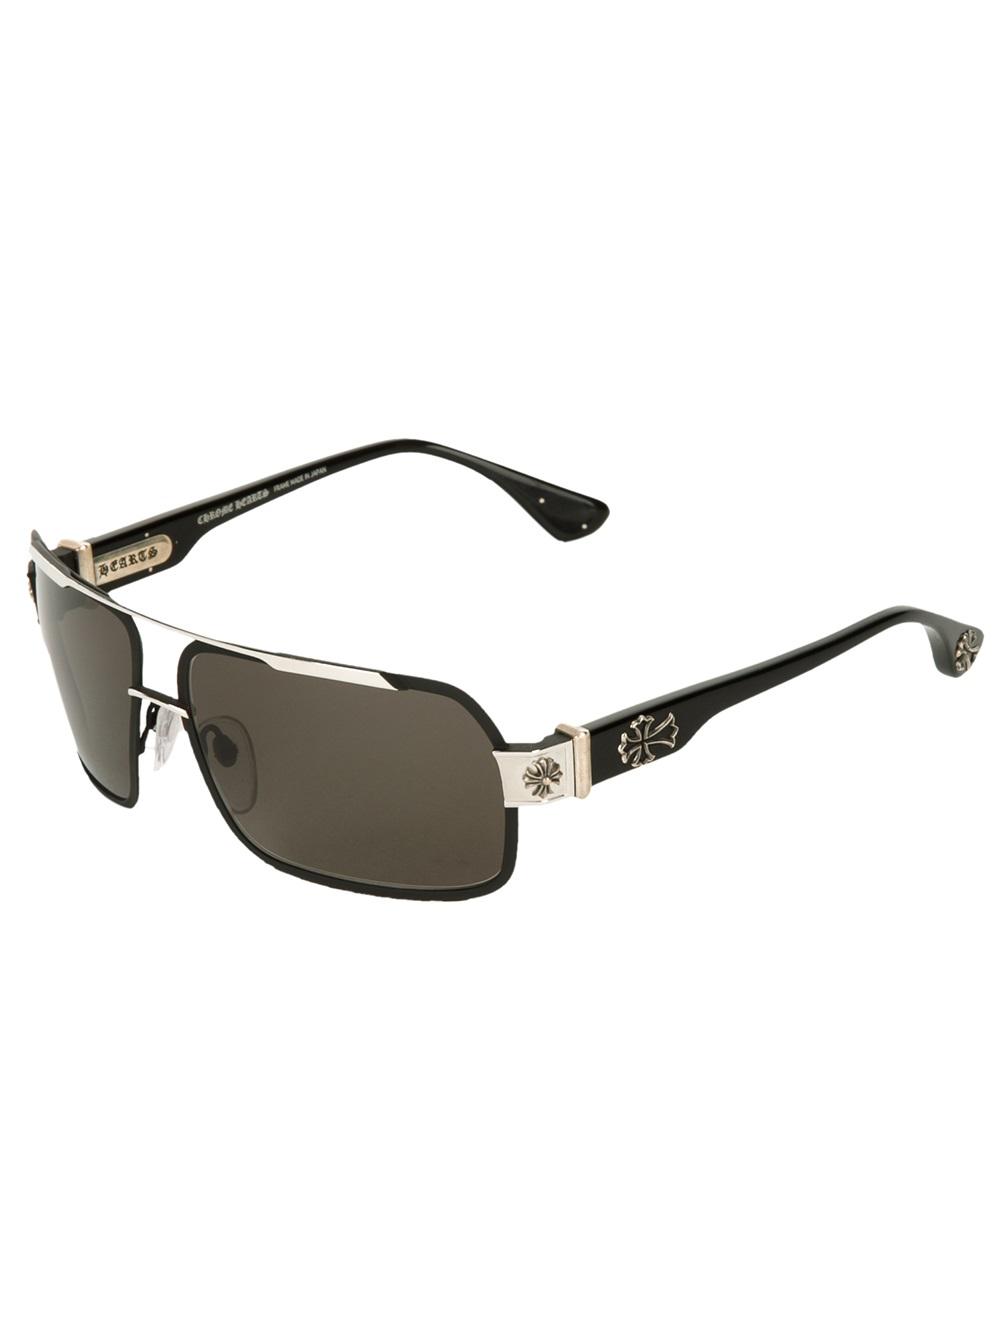 a5e7372d9b66 Lyst - Chrome Hearts Hummer Sunglasses in Black for Men